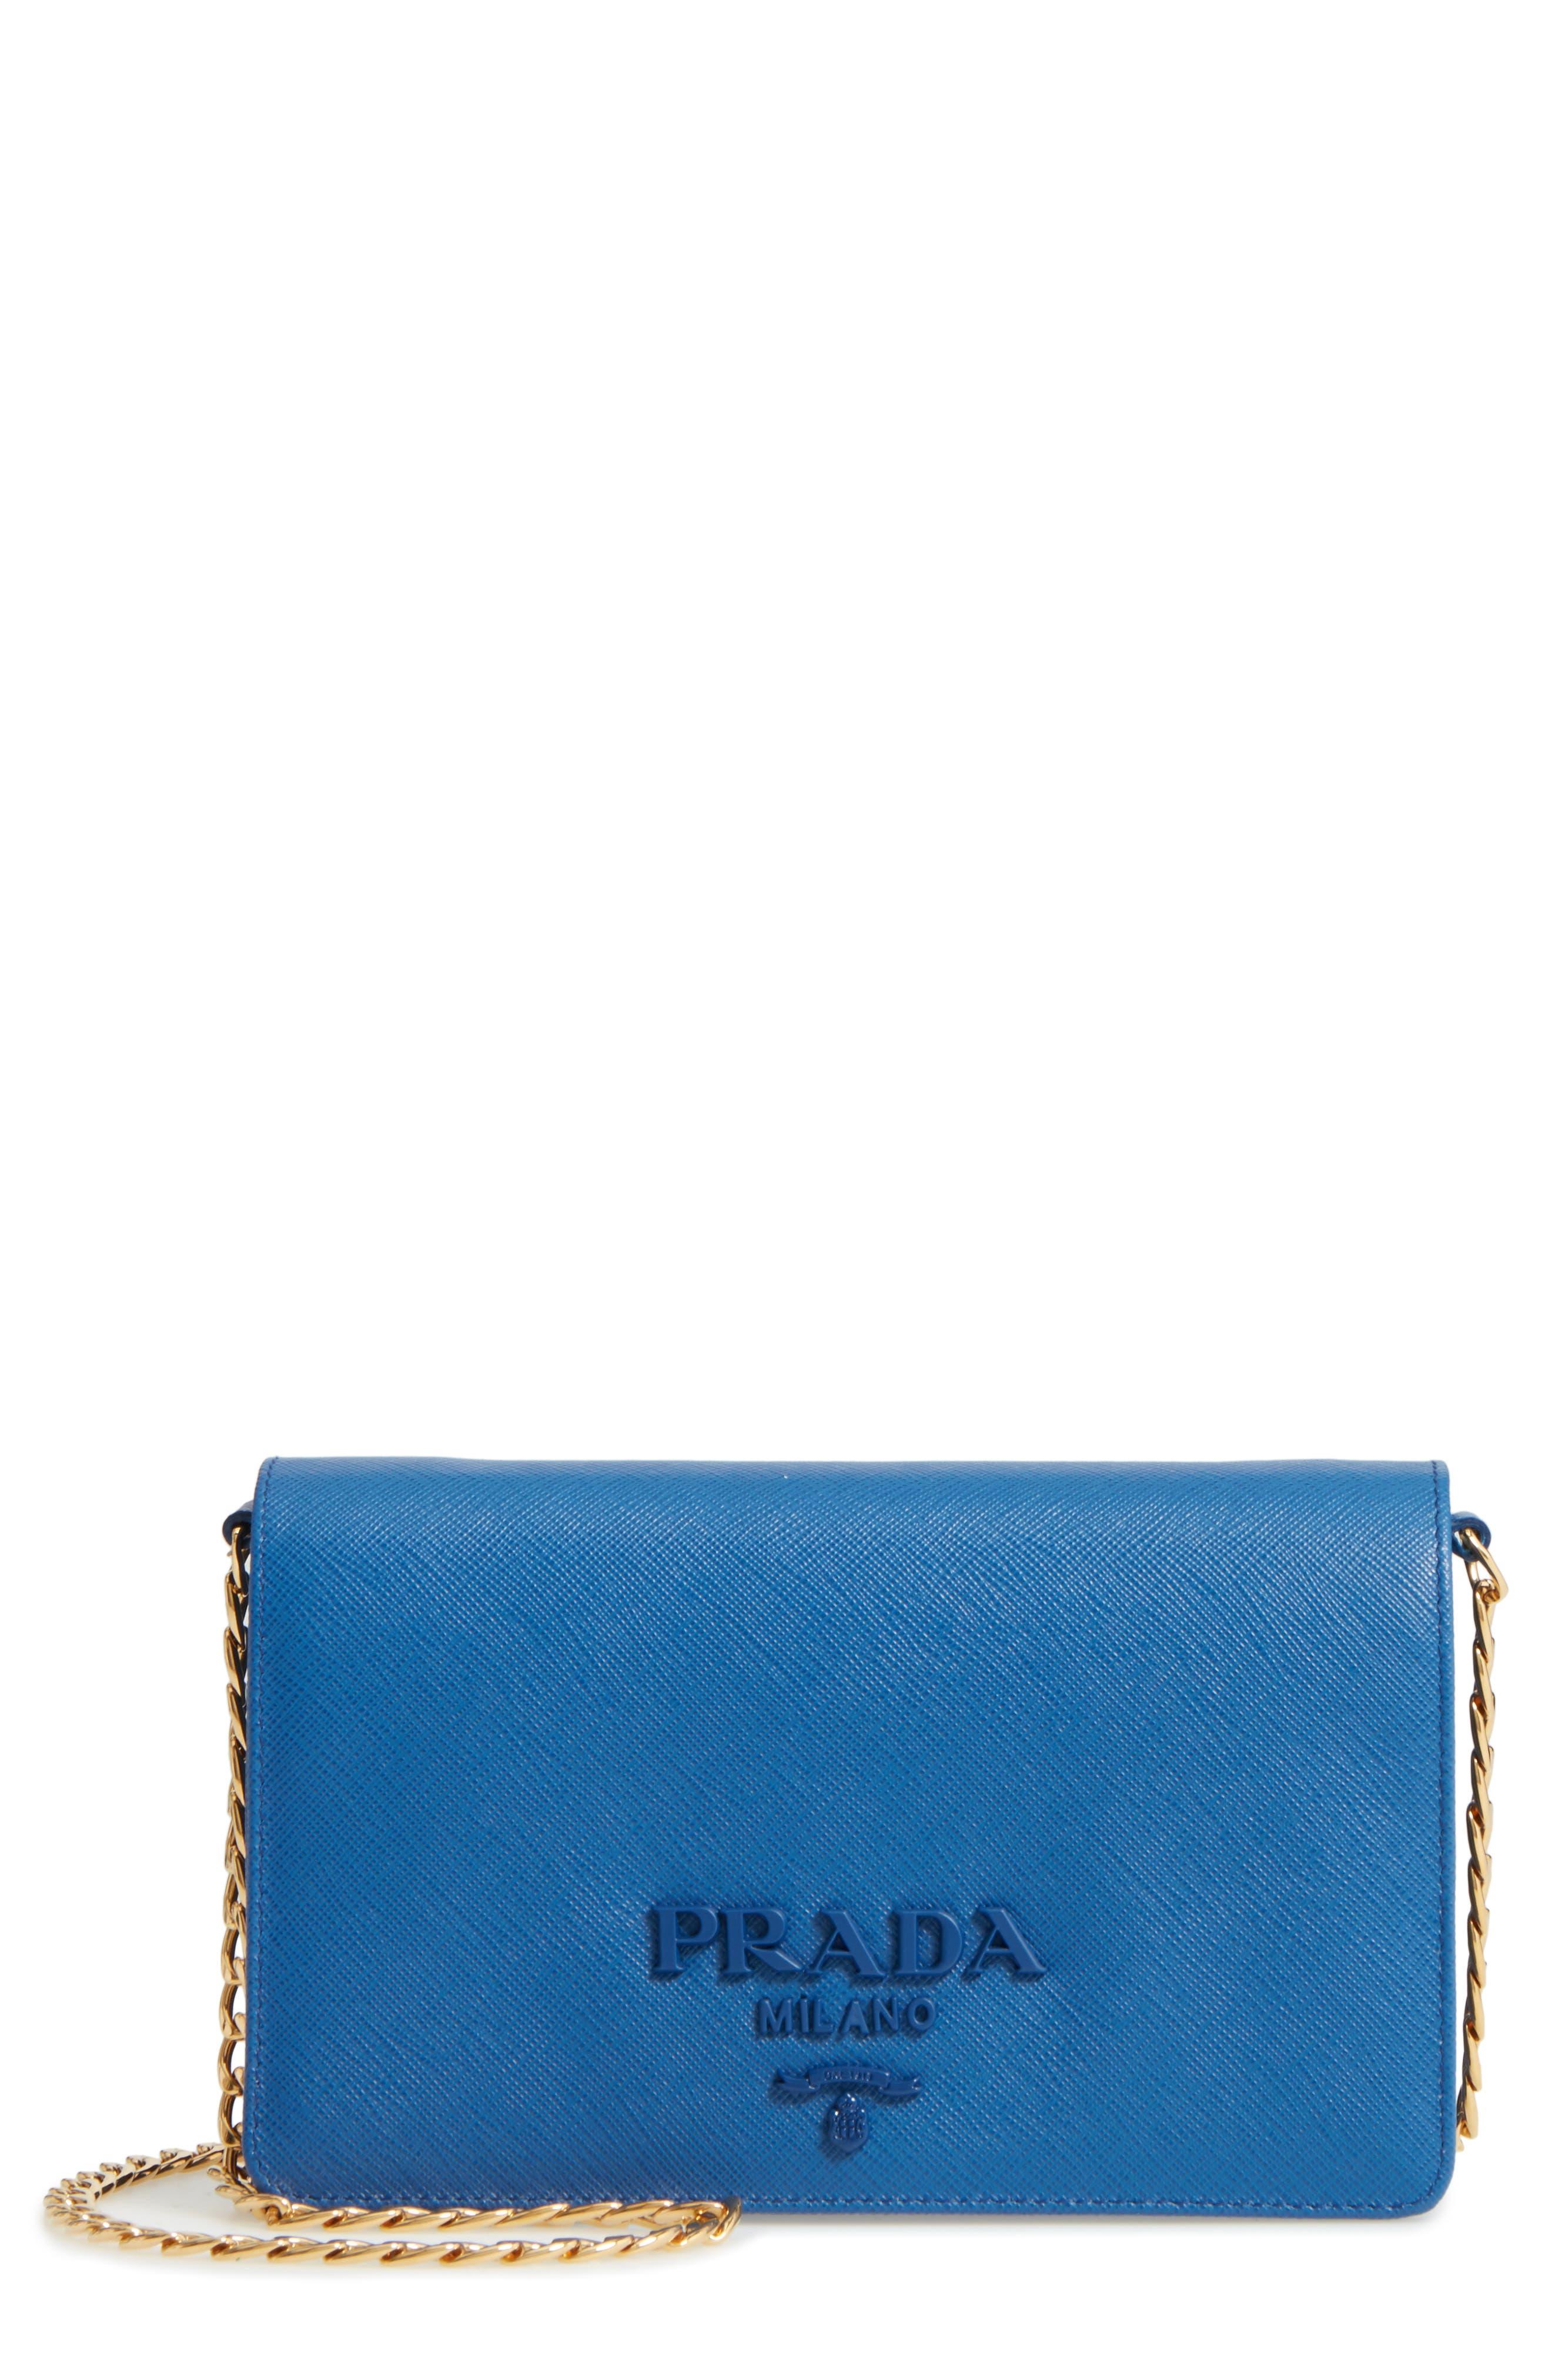 3abbbf9c7cc Prada Crossbody Bags | Nordstrom